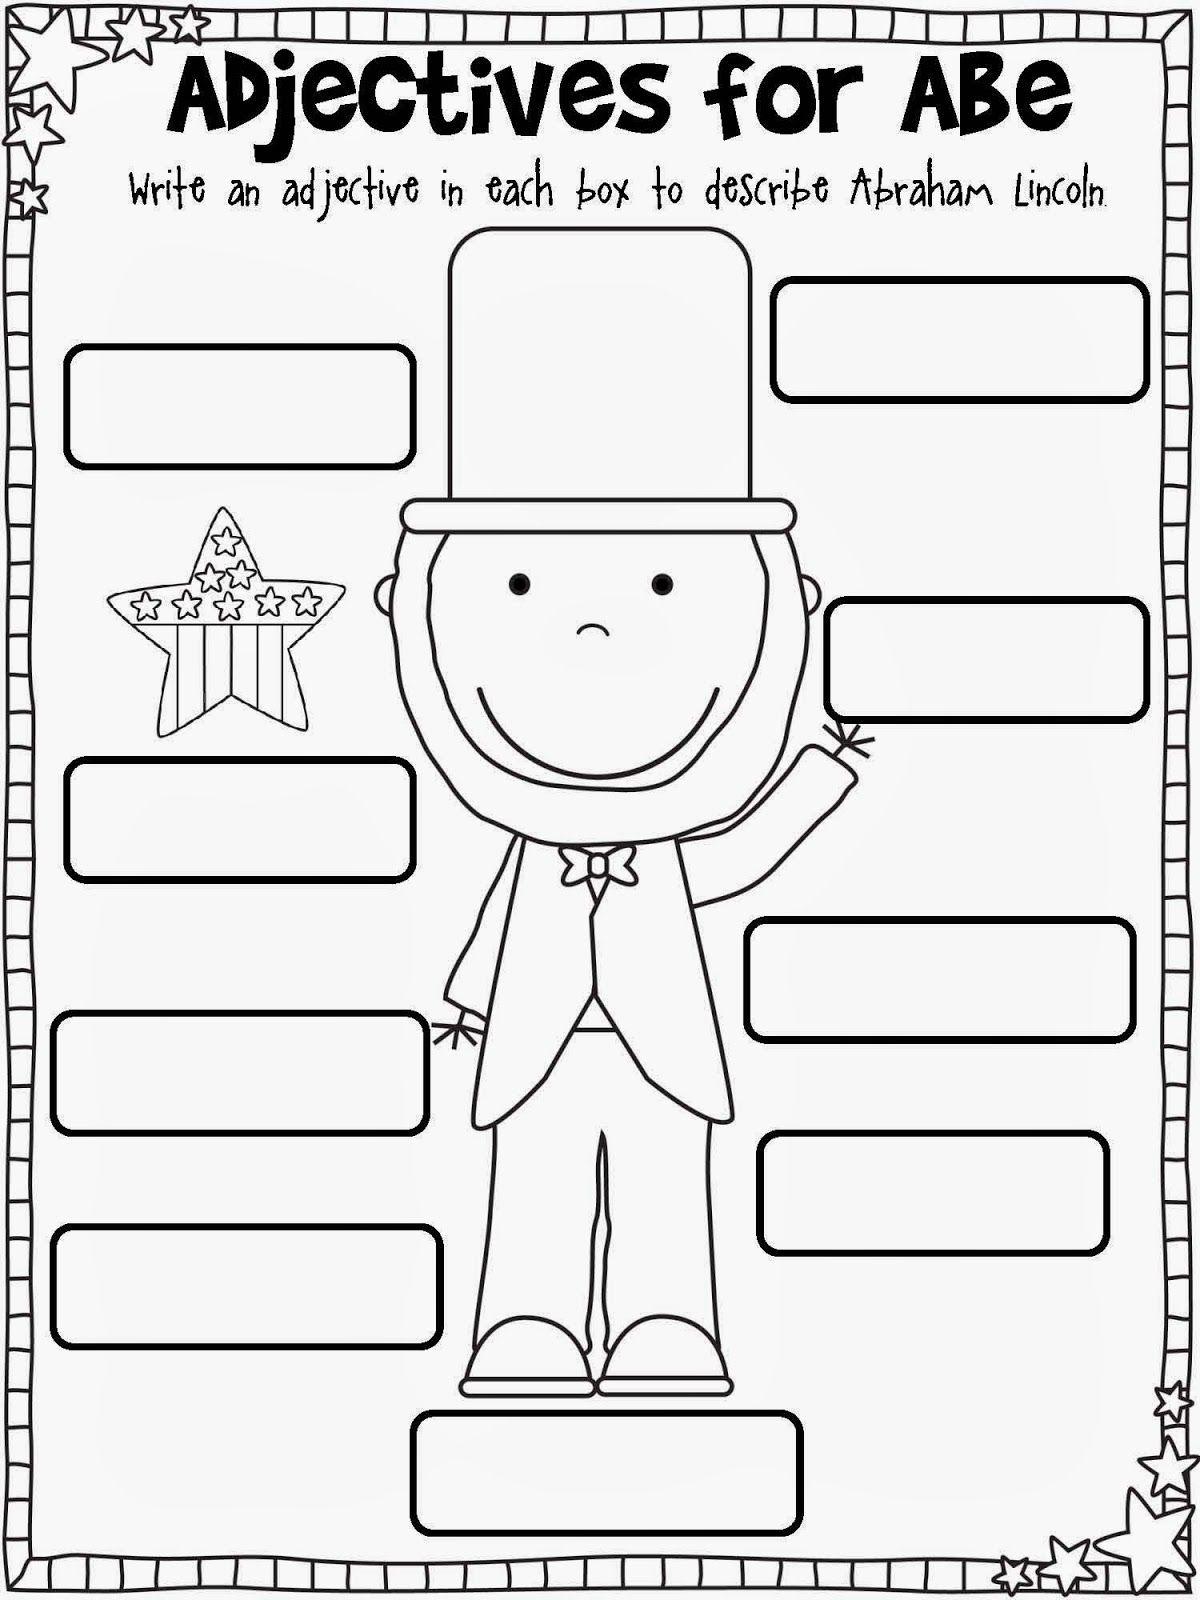 Worksheets Abraham Lincoln Worksheets Cheatslist Free